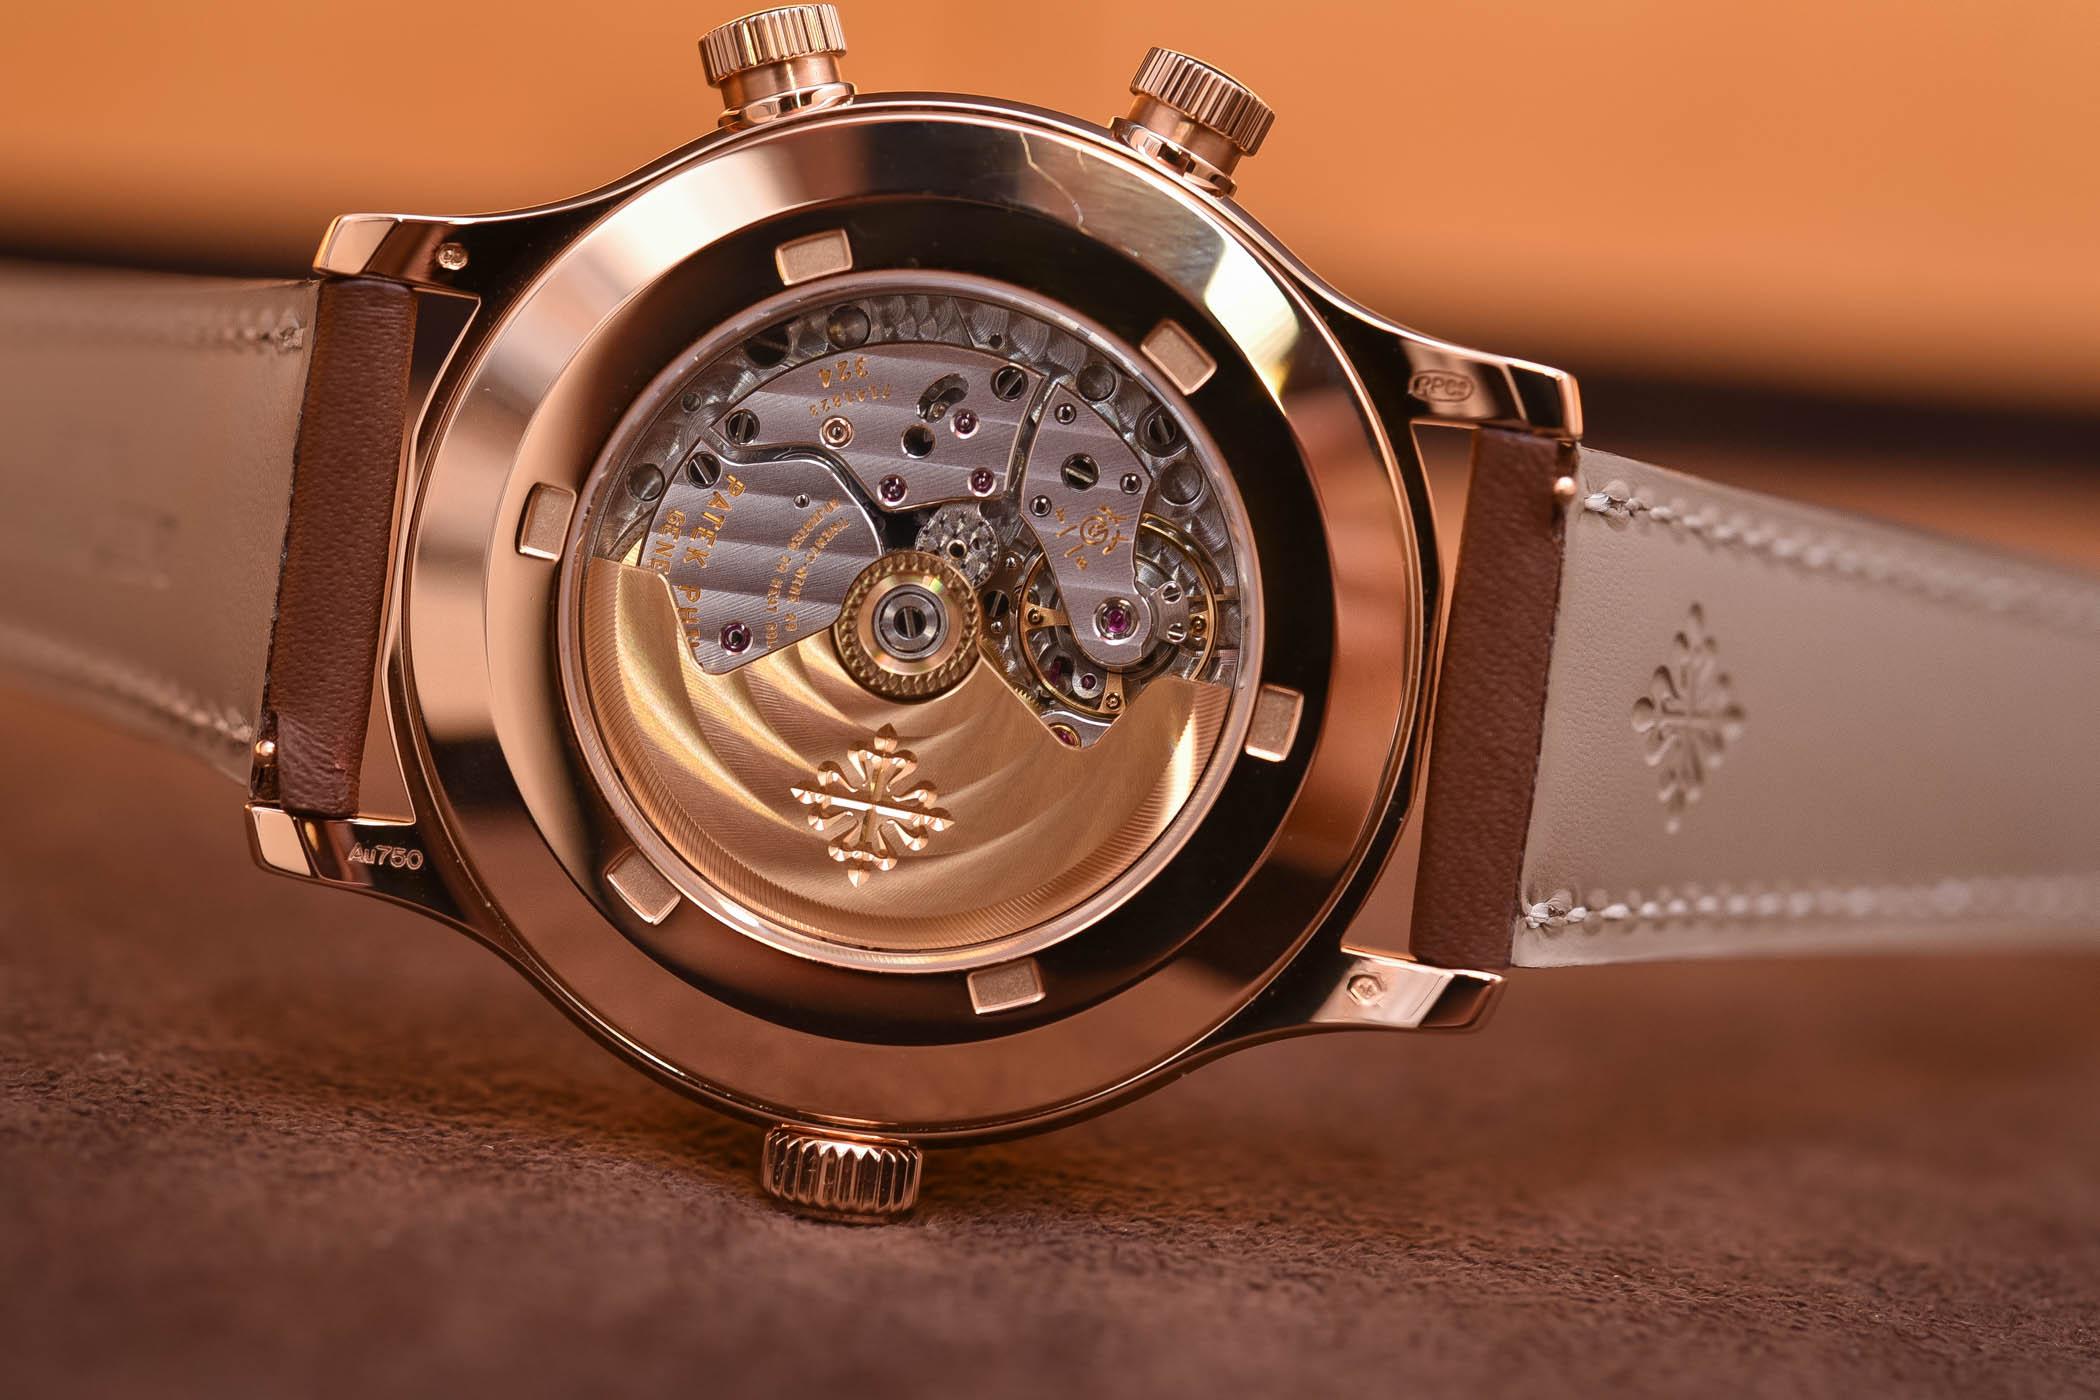 Patek Philippe Calatrava Pilot Travel Time 5524R Rose Gold